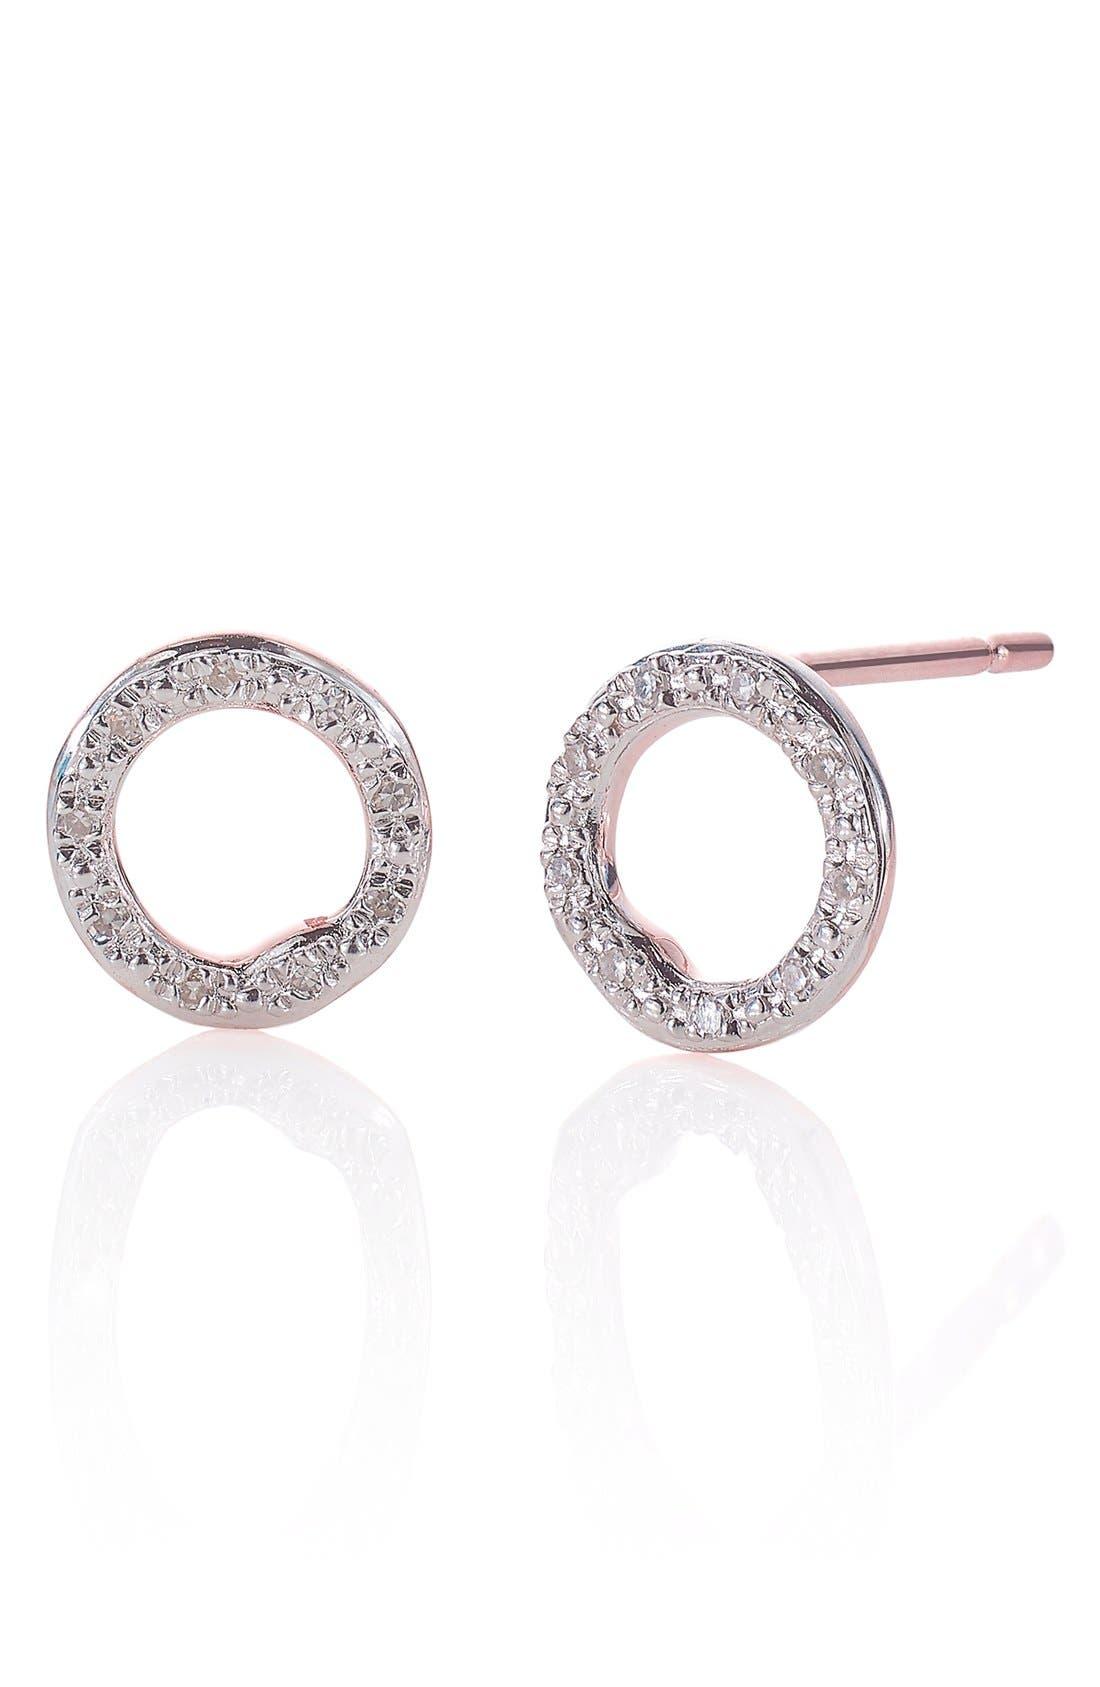 MONICA VINADER, 'Riva' Circle Stud Diamond Earrings, Main thumbnail 1, color, ROSE GOLD